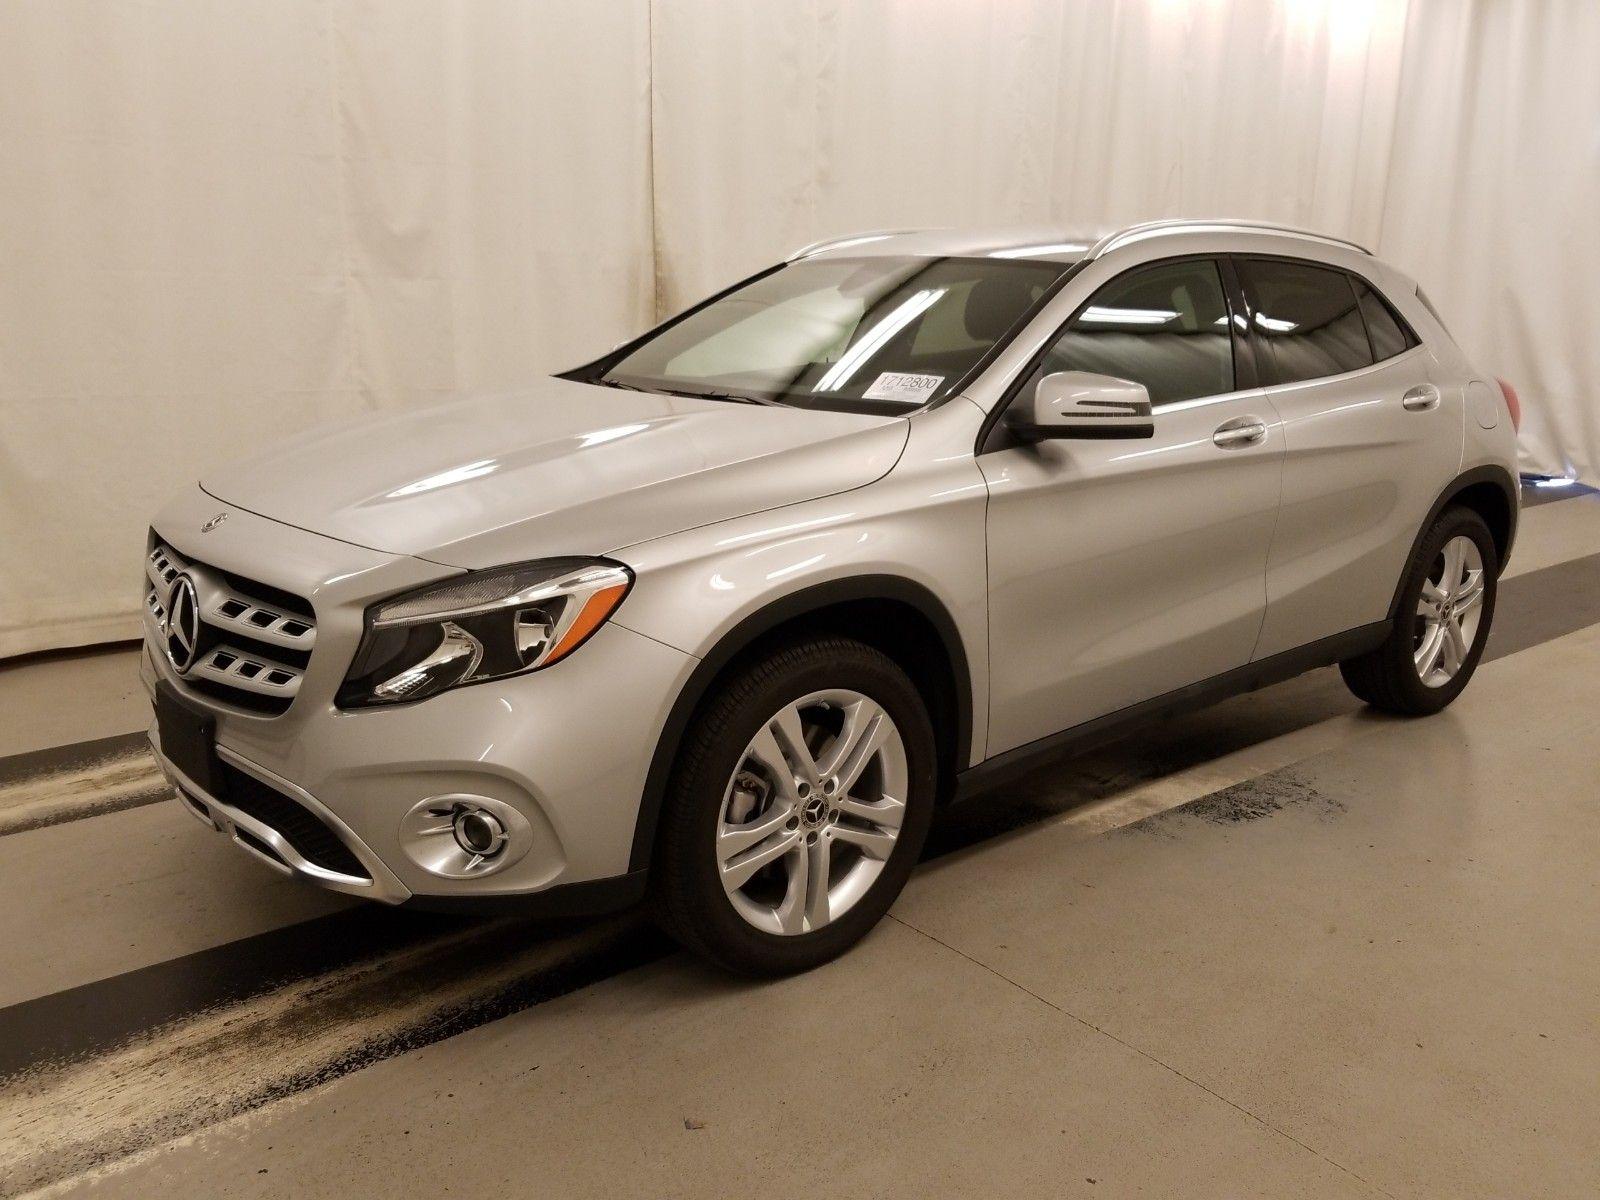 2018 Mercedes-benz Gla 2.0. Lot 99912148584 Vin WDCTG4EB3JJ492491